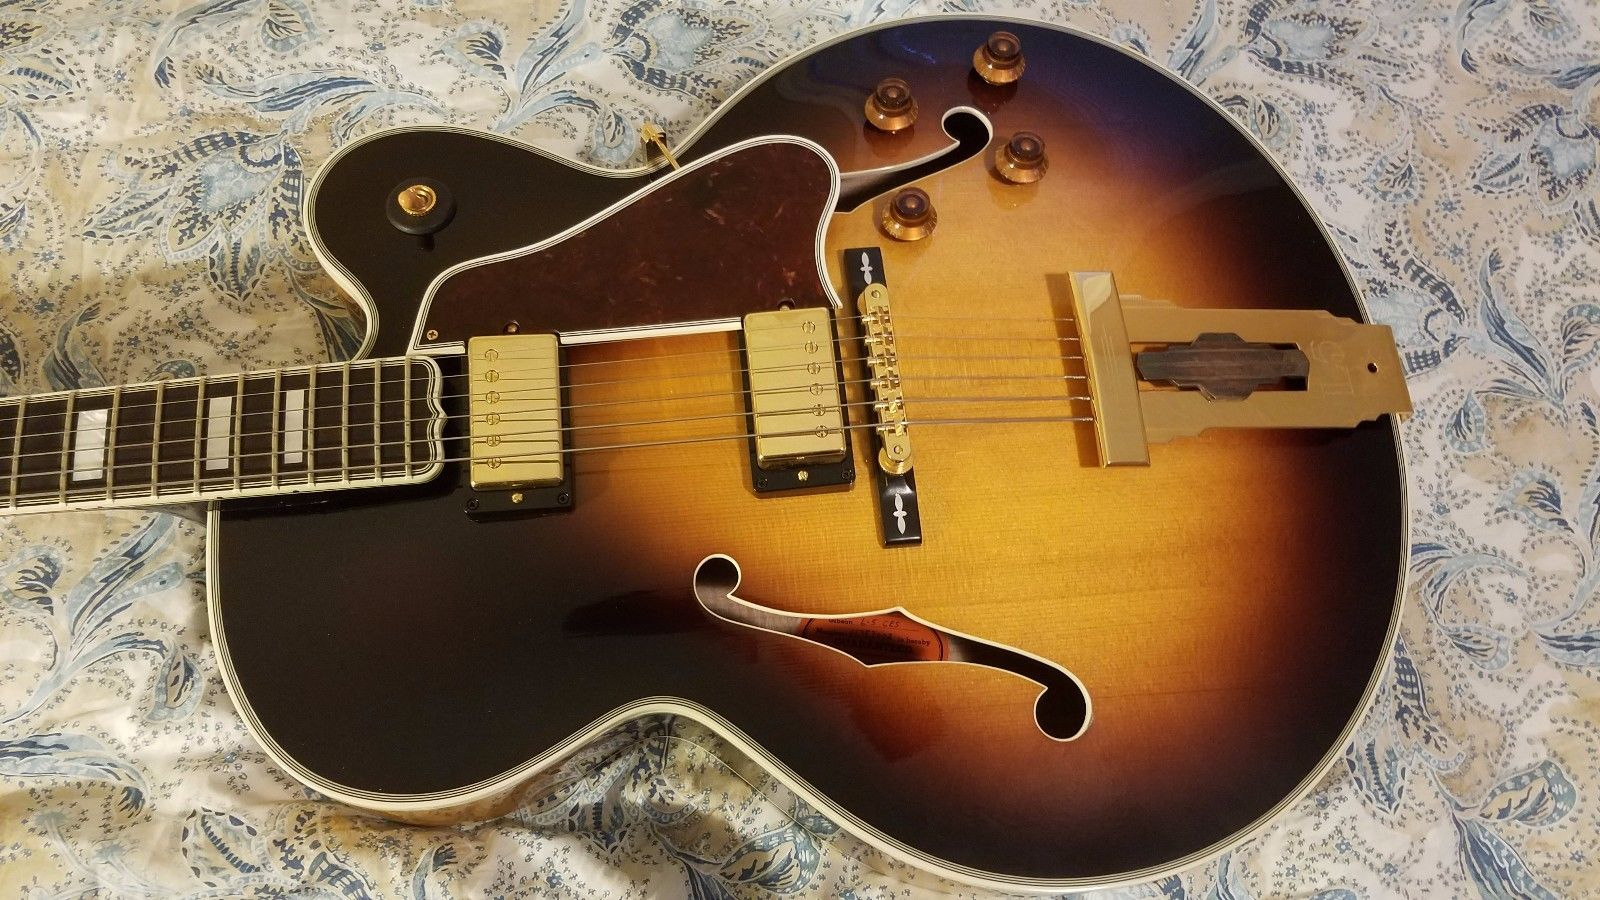 gibson l5 ces vintage sunburst 2013 annonce guitare gibson. Black Bedroom Furniture Sets. Home Design Ideas